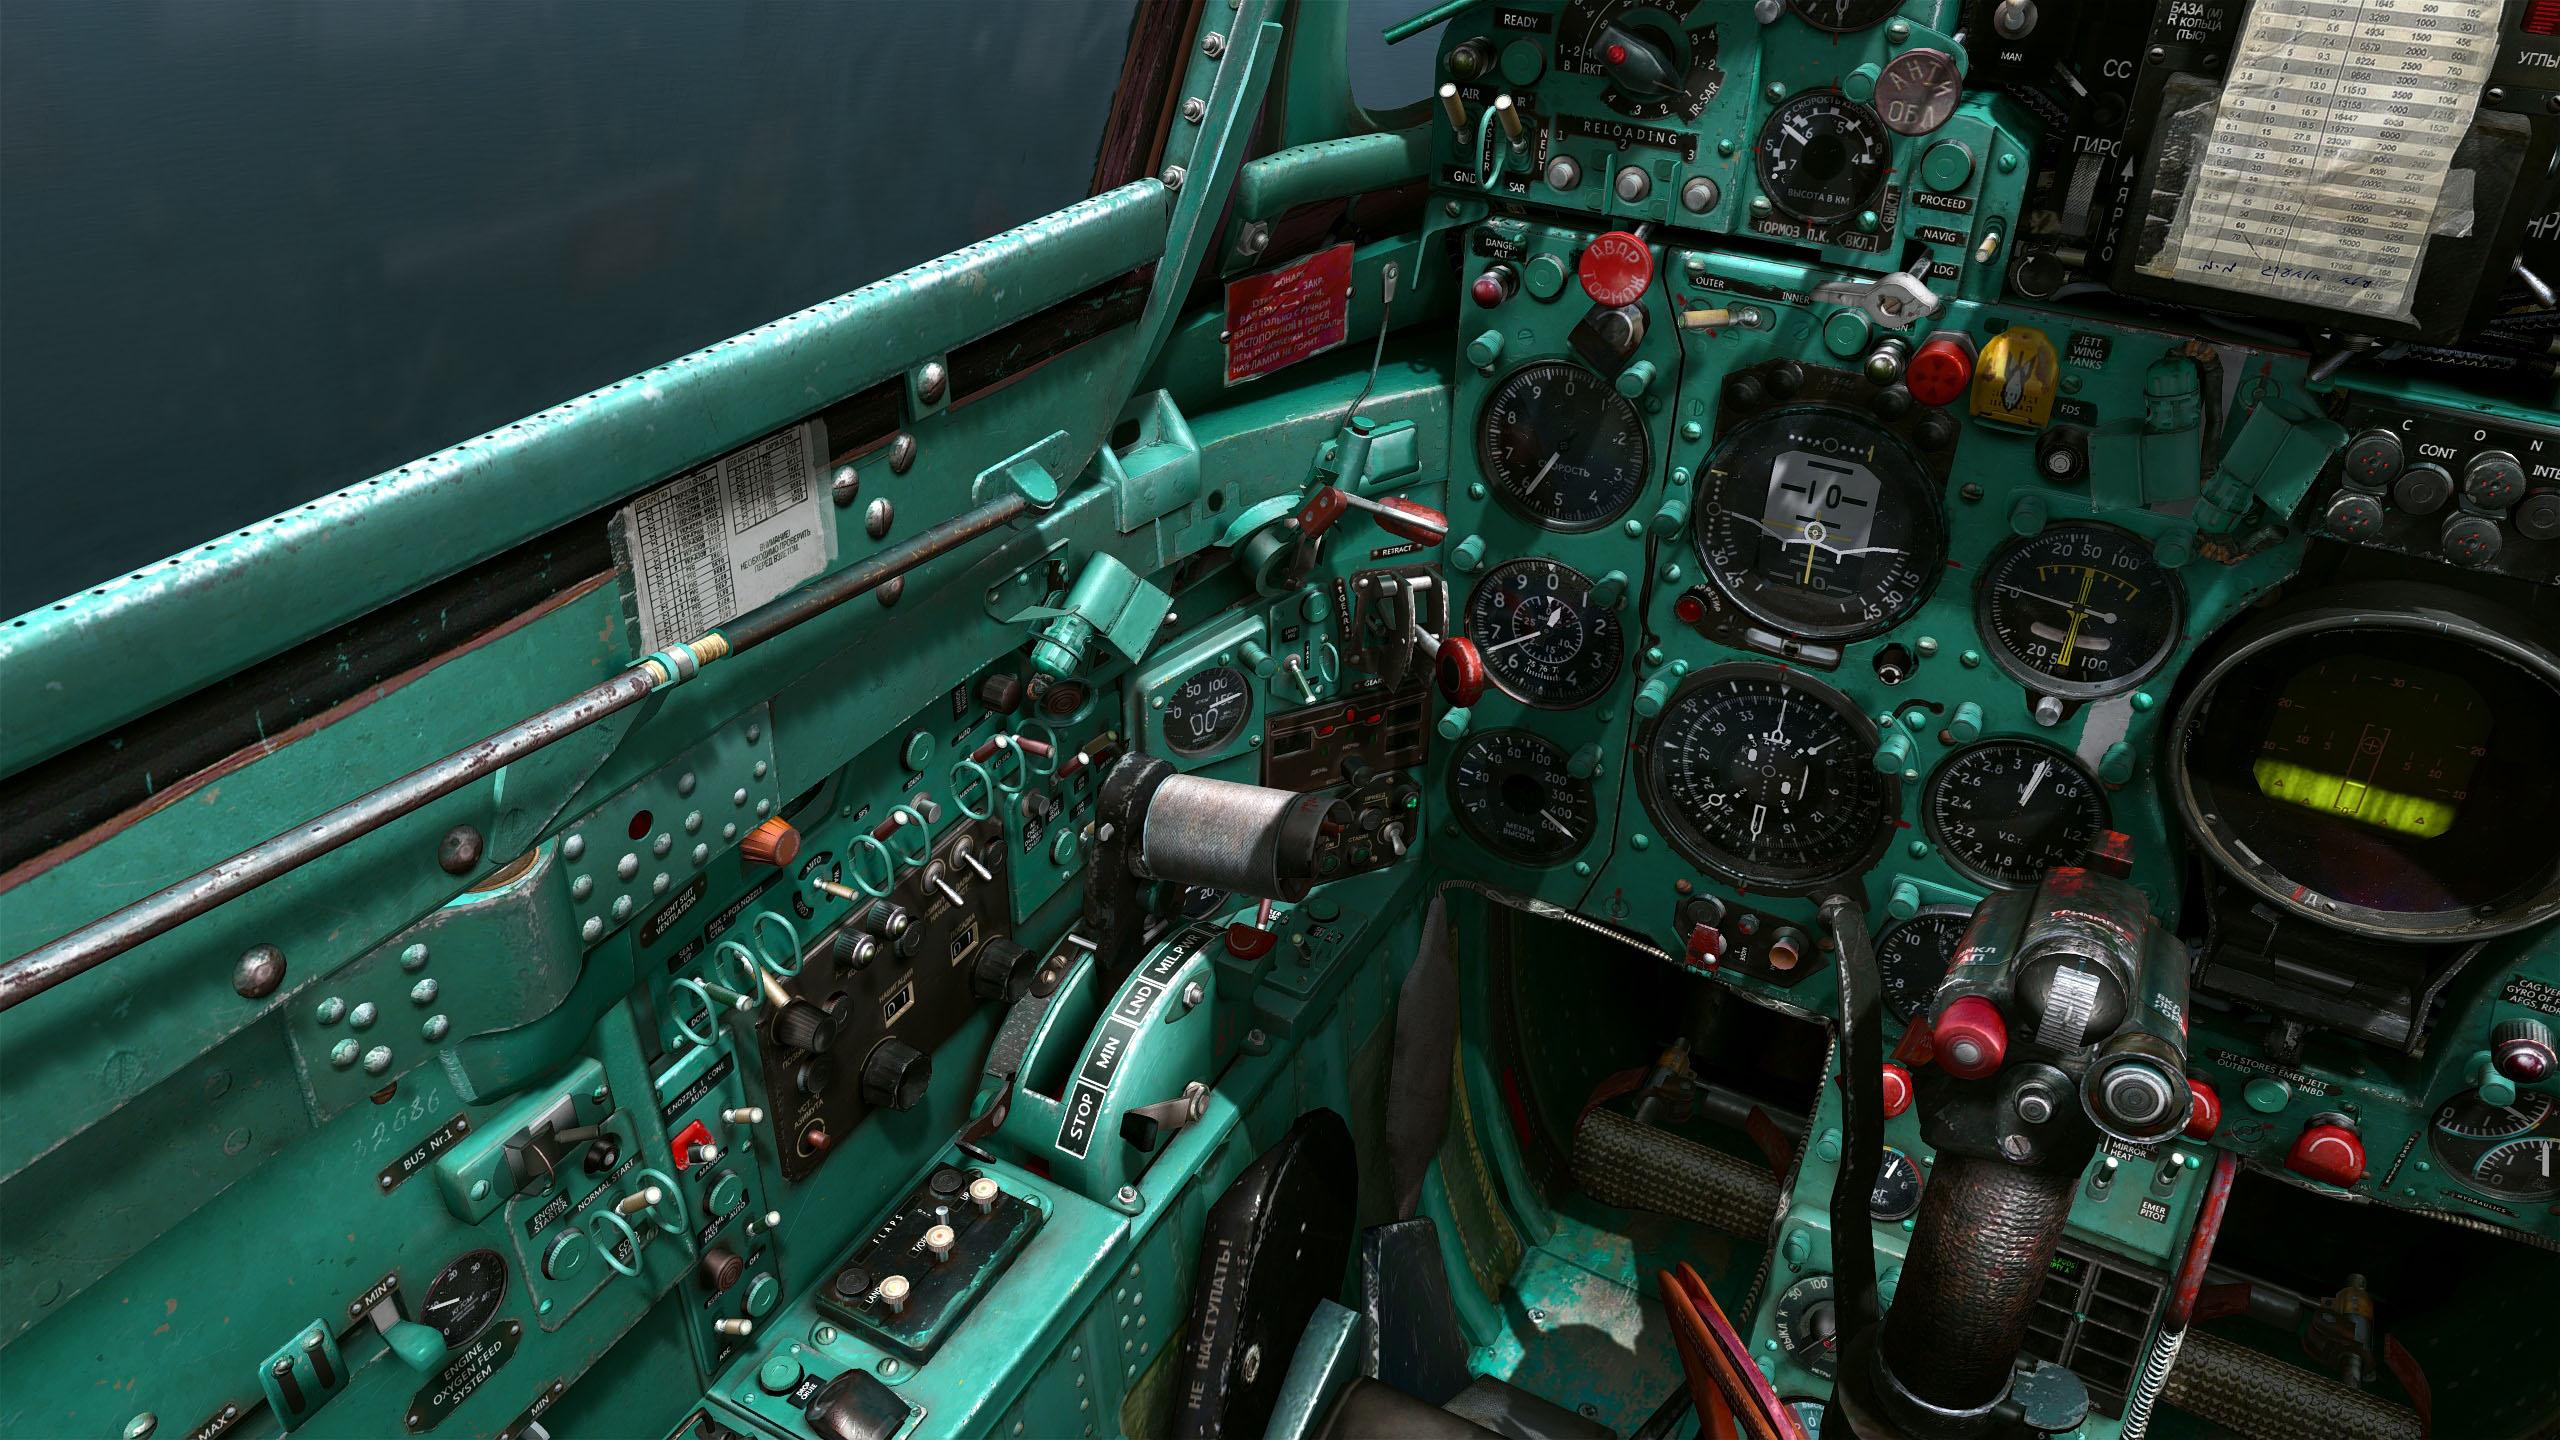 mig21 green cockpit